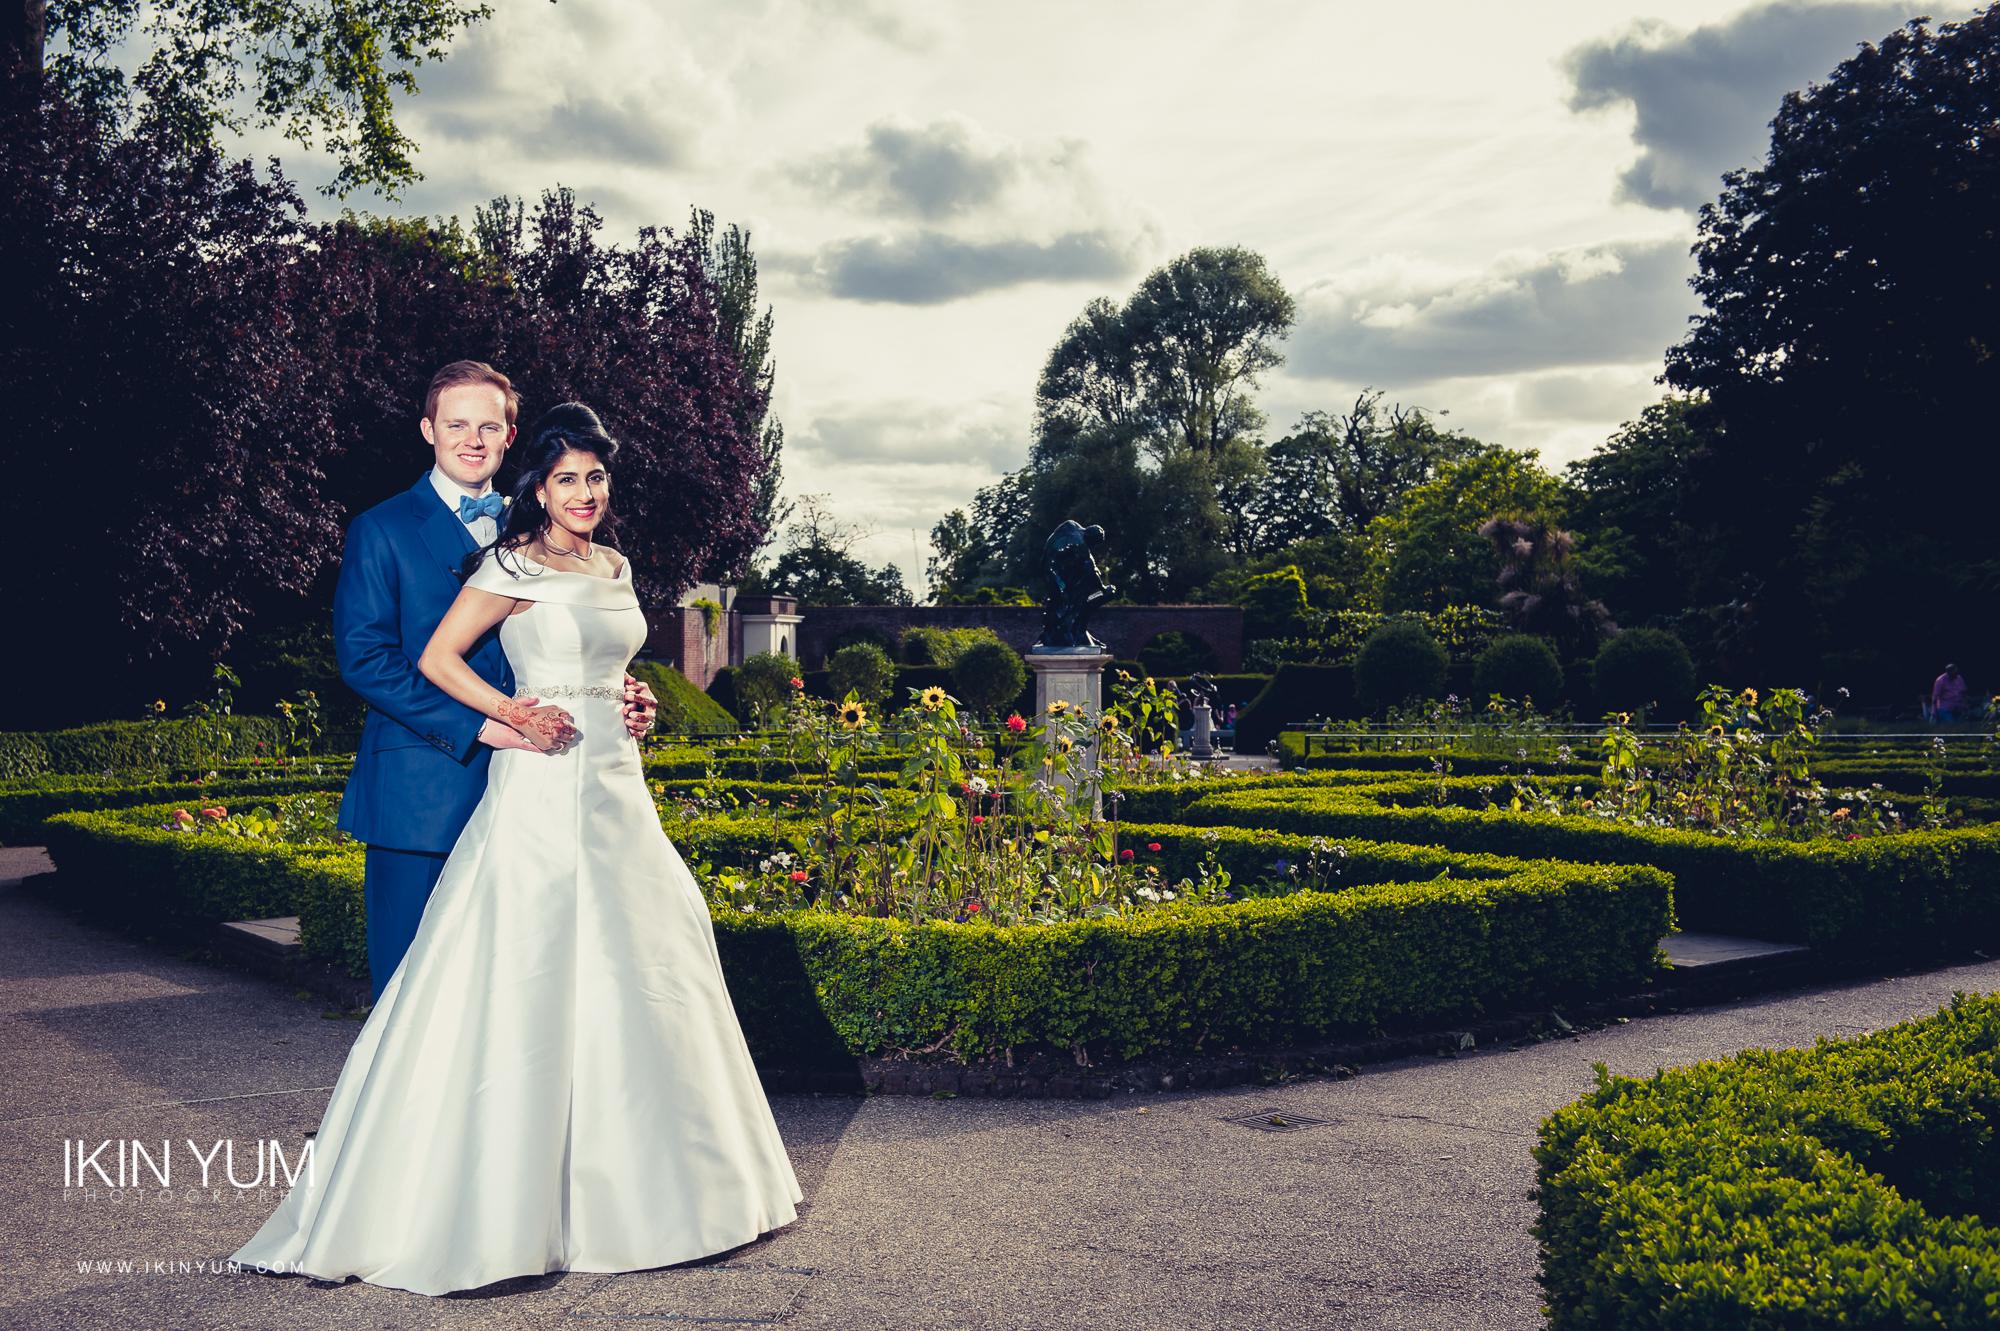 Holland Park Wedding - Ikin Yum Photography-0053.jpg